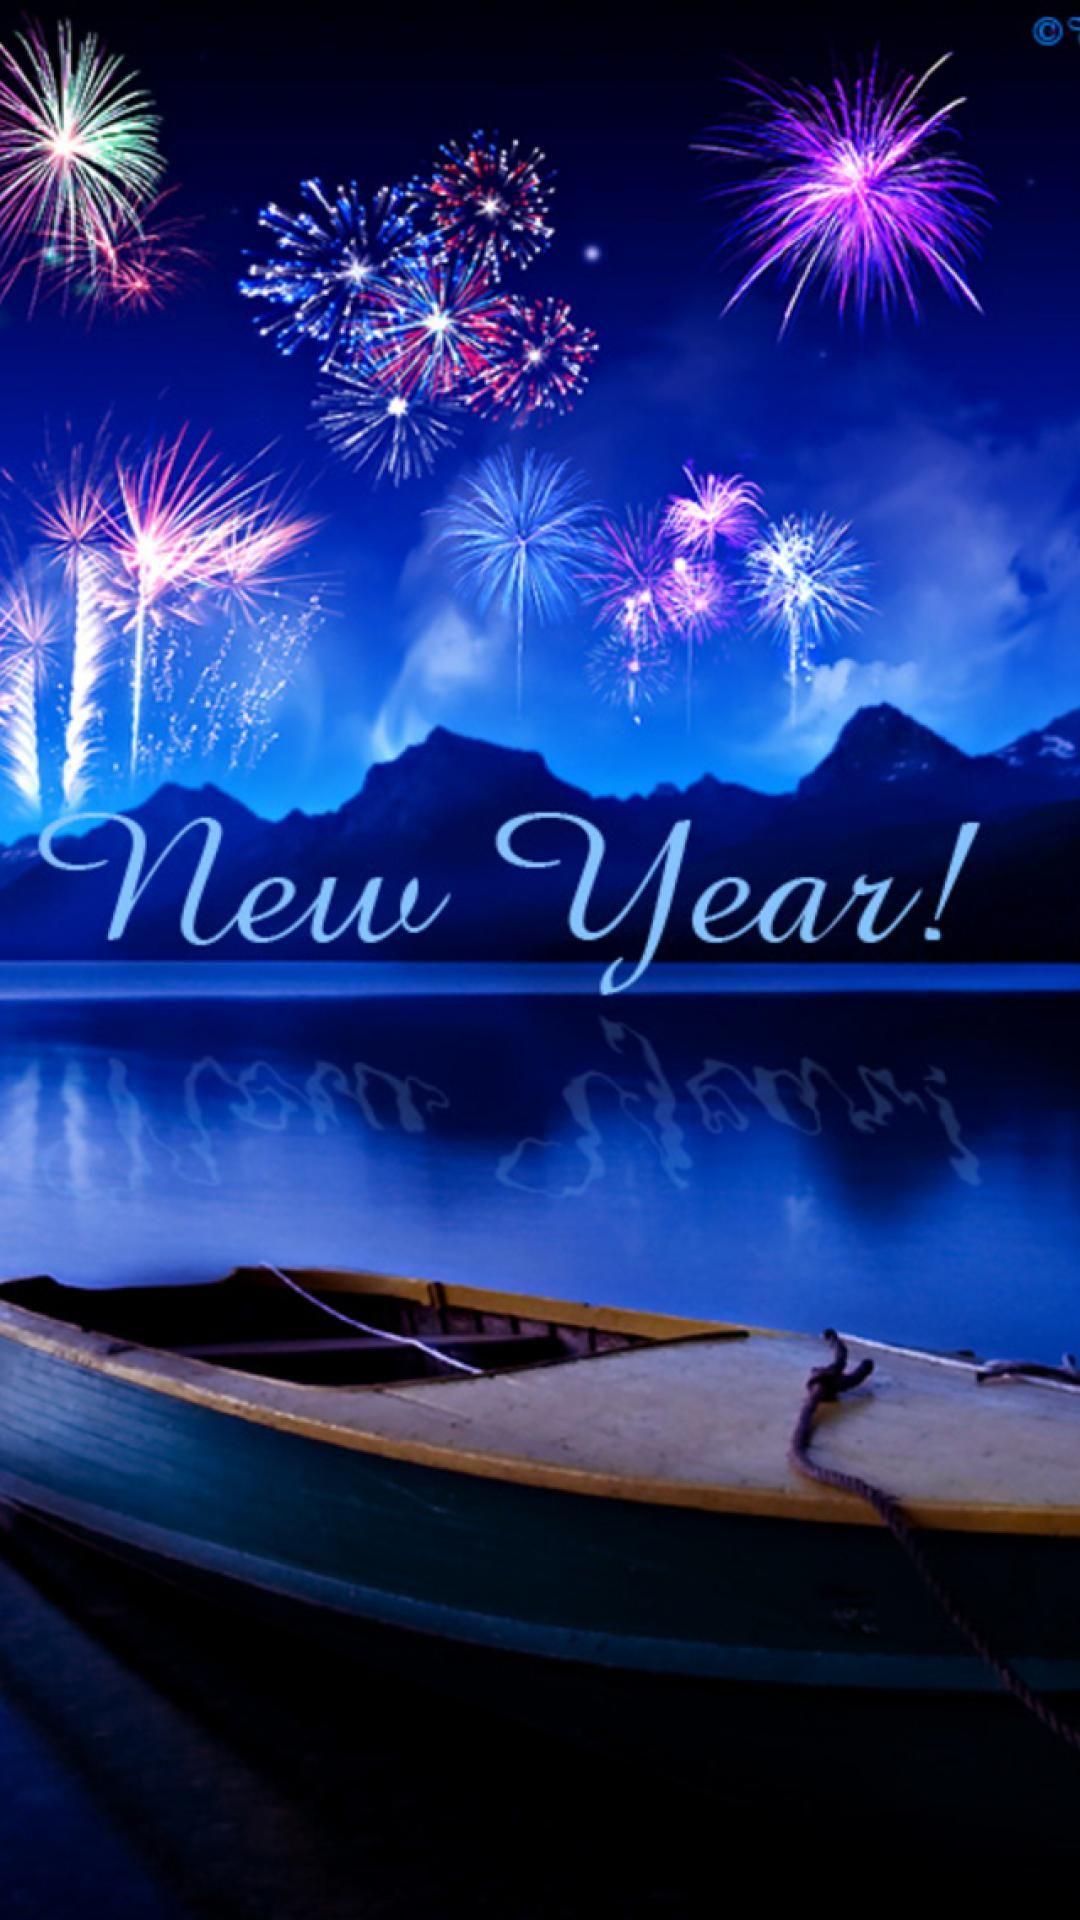 Iphone 6 Retina Wallpaper Happy New Year Wallpaper Happy New Year Images New Year Wallpaper